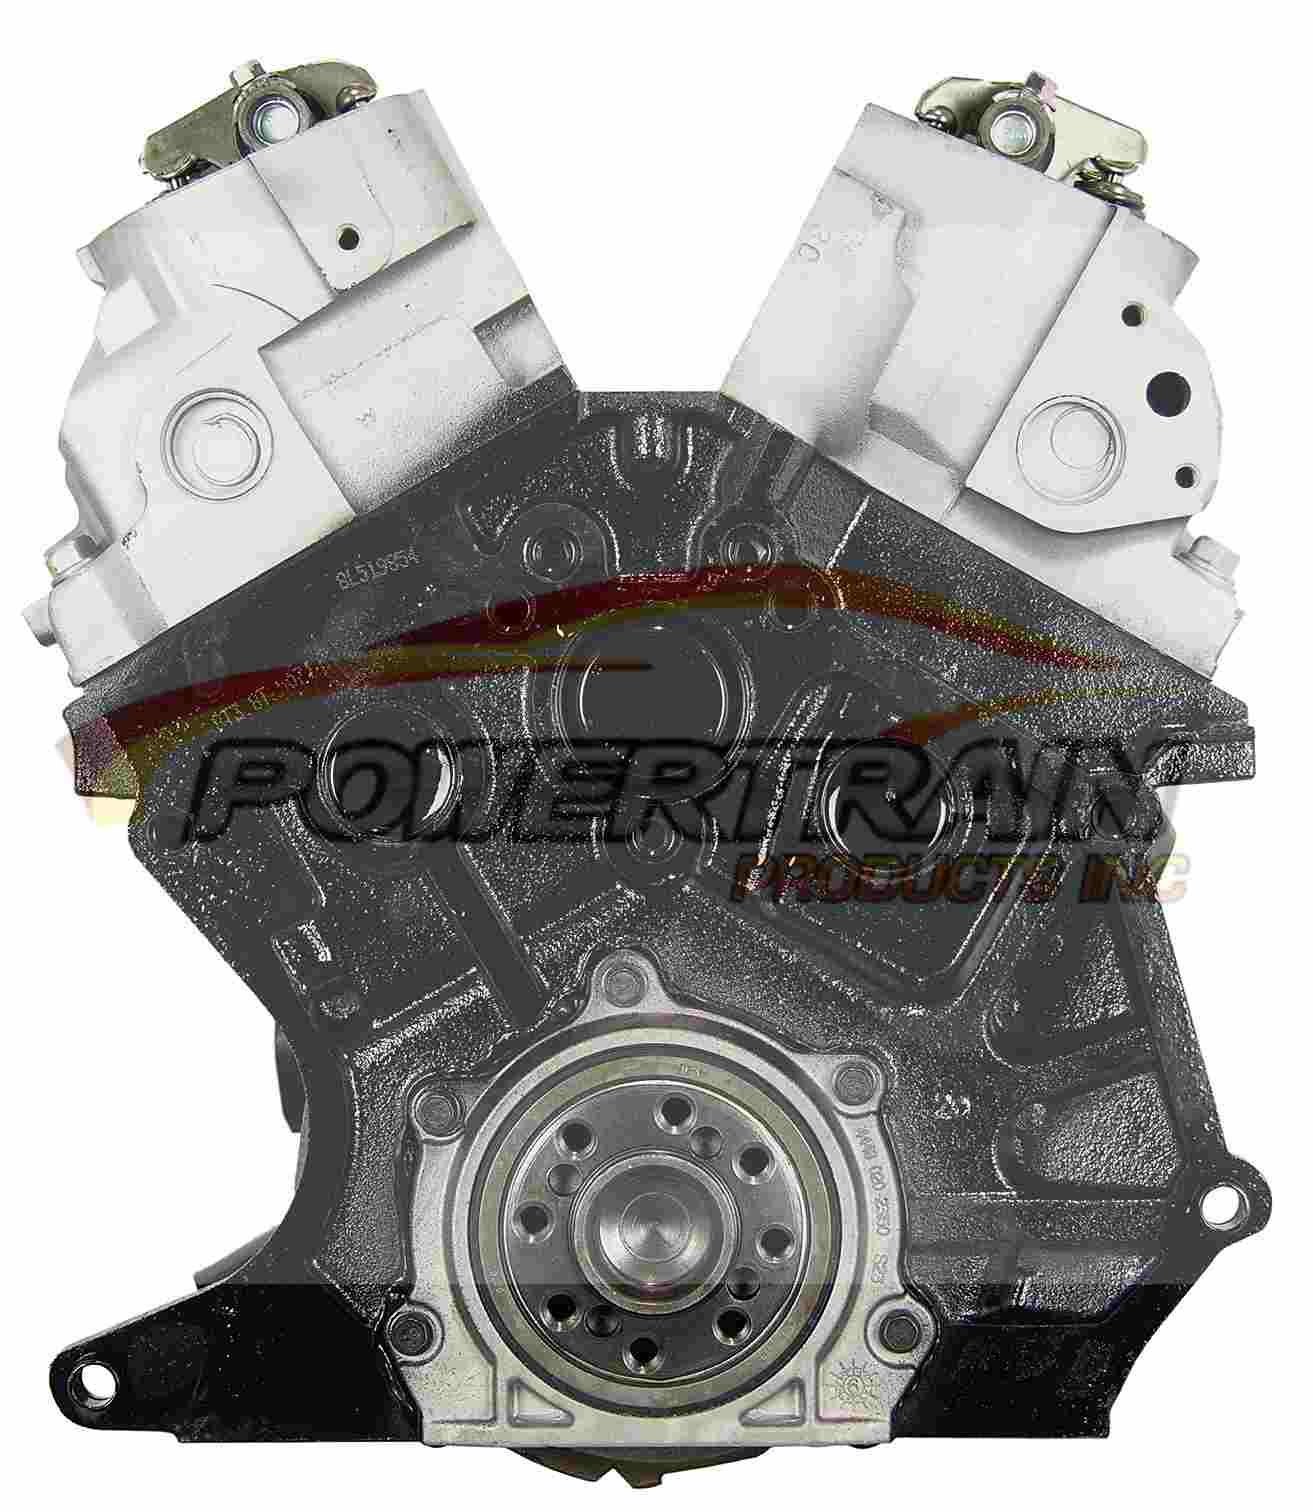 Jeep Wrangler Engine 2007 2011 38 4 0 Stroker For Sale